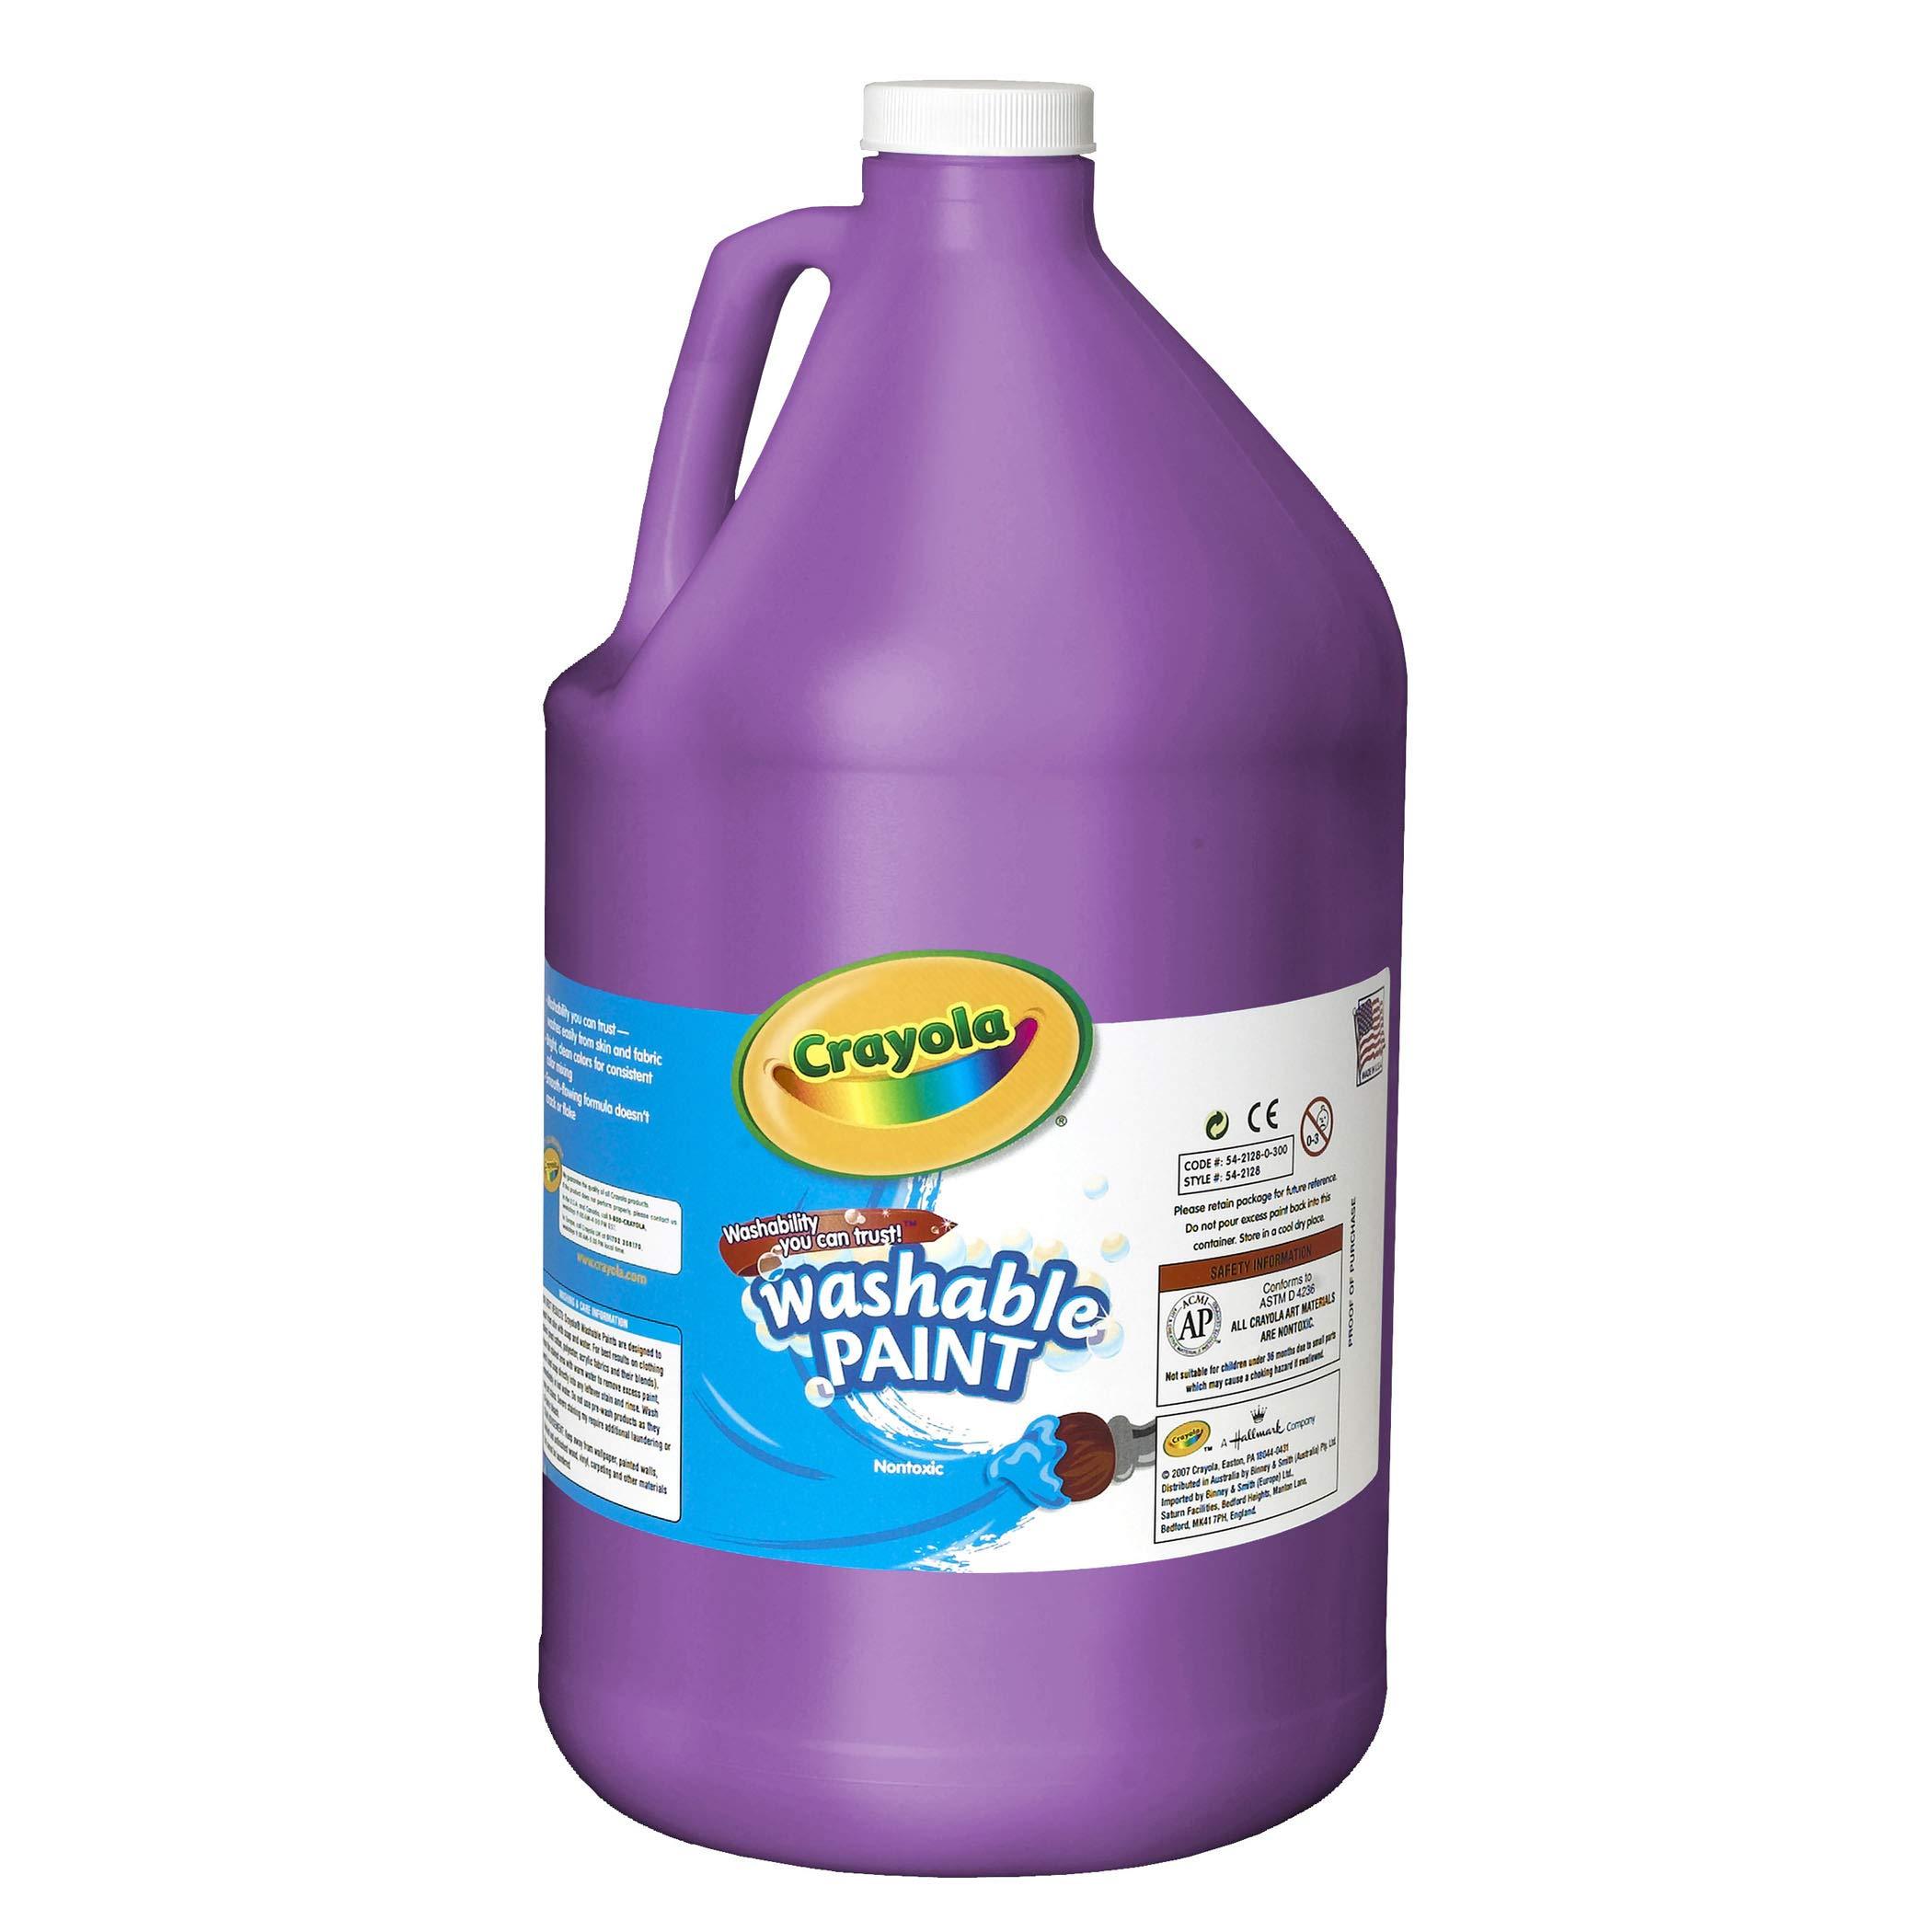 Crayola BIN212840 Washable Paint, Violet, Gallon